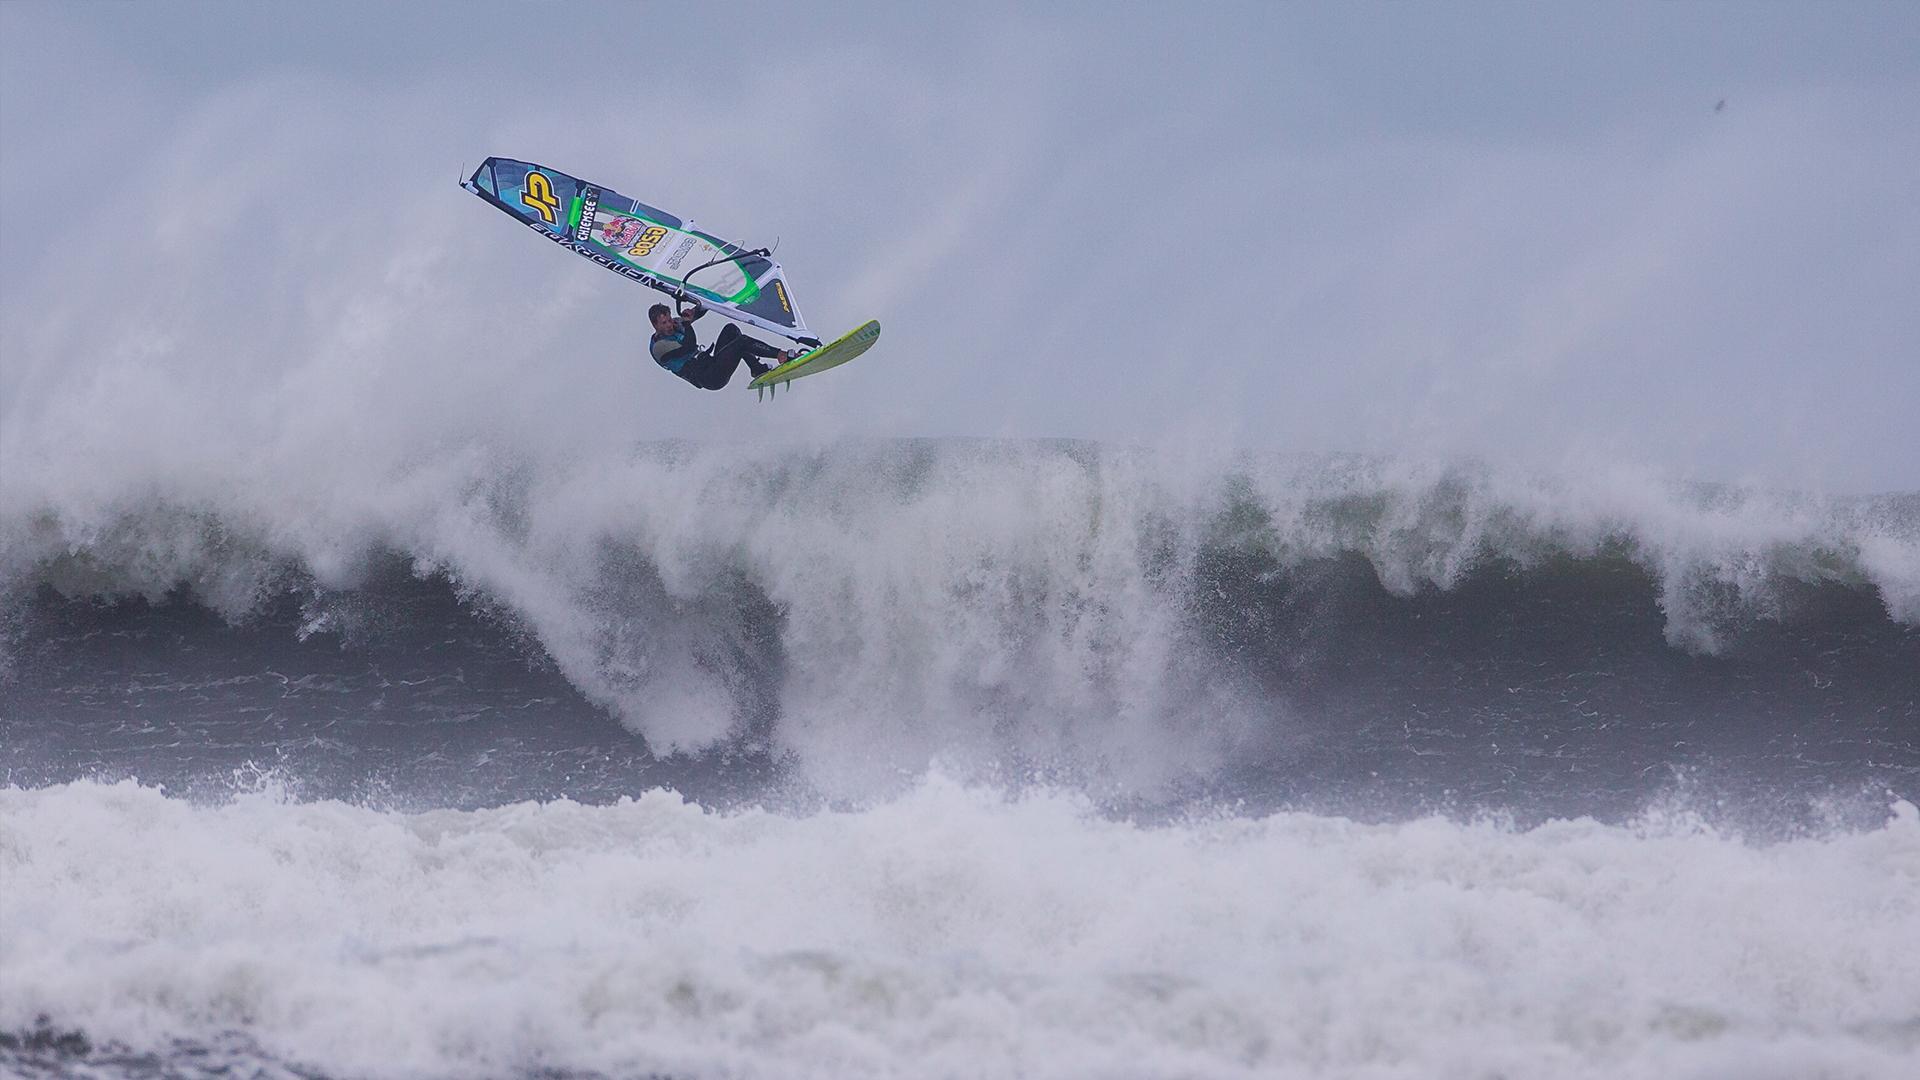 Windsurfing in Extreme Hurricane